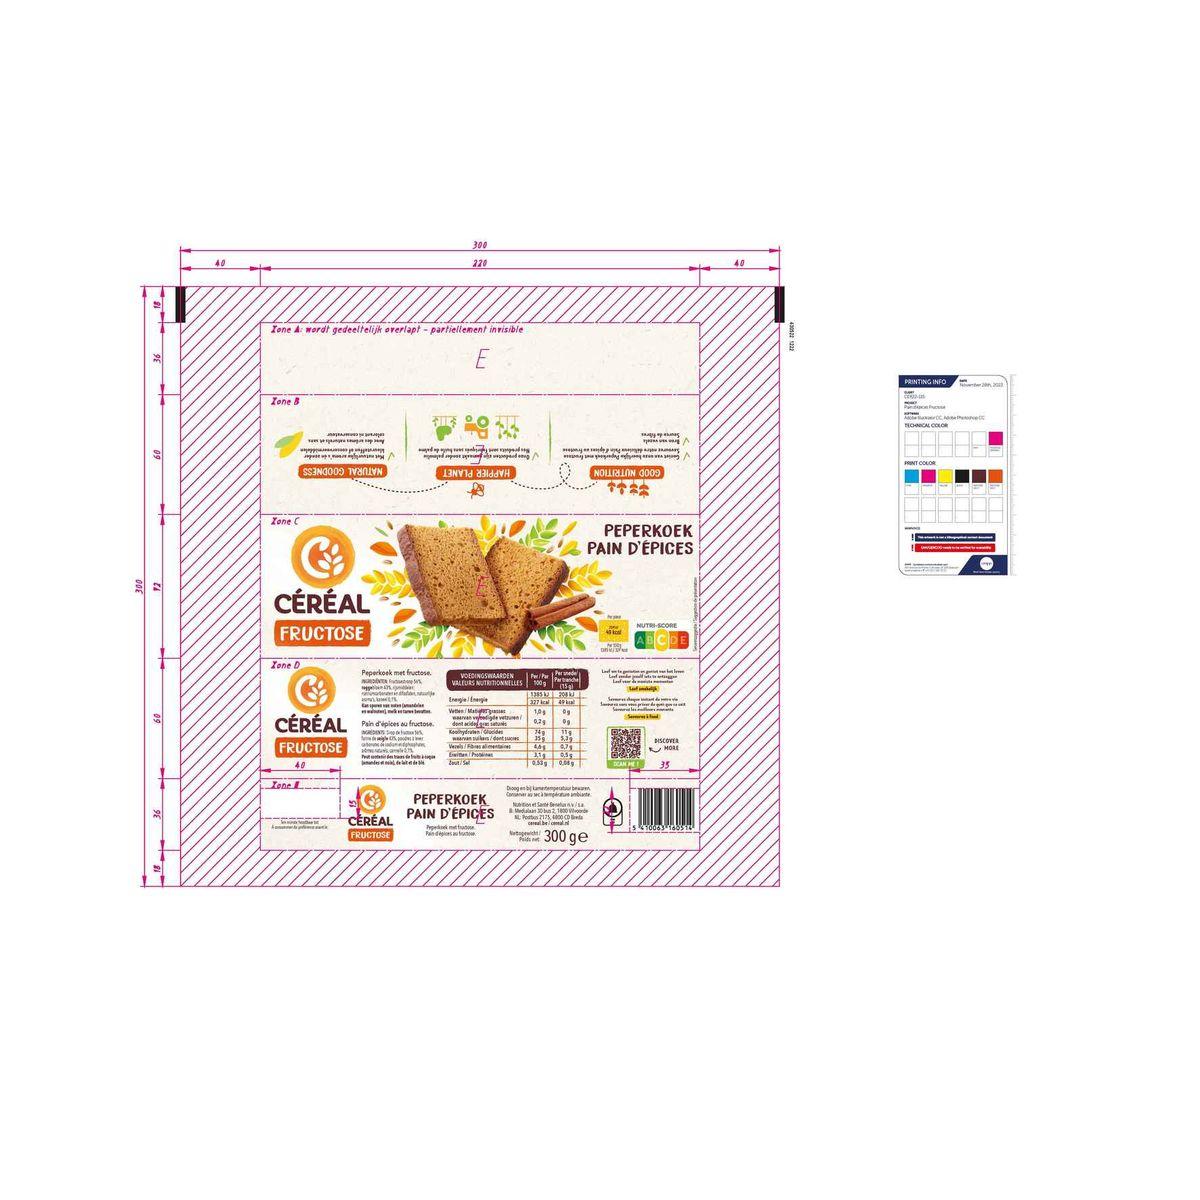 Céréal Peperkoek Fructose 300 g